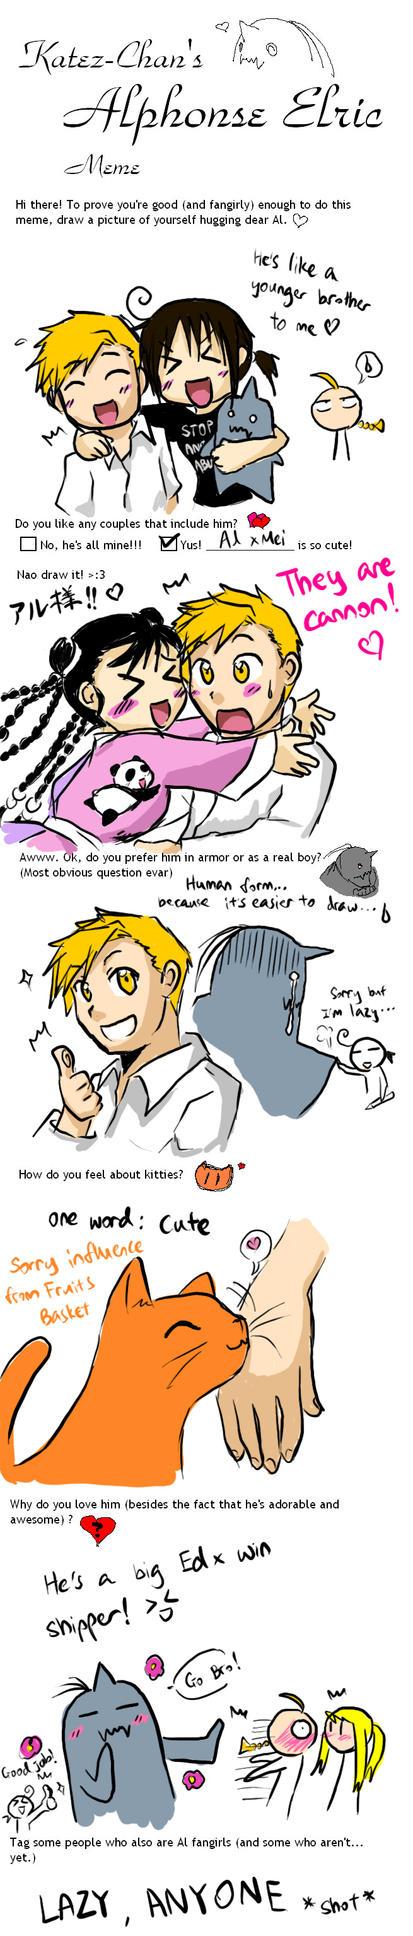 Alphonse meme X3 by qianying